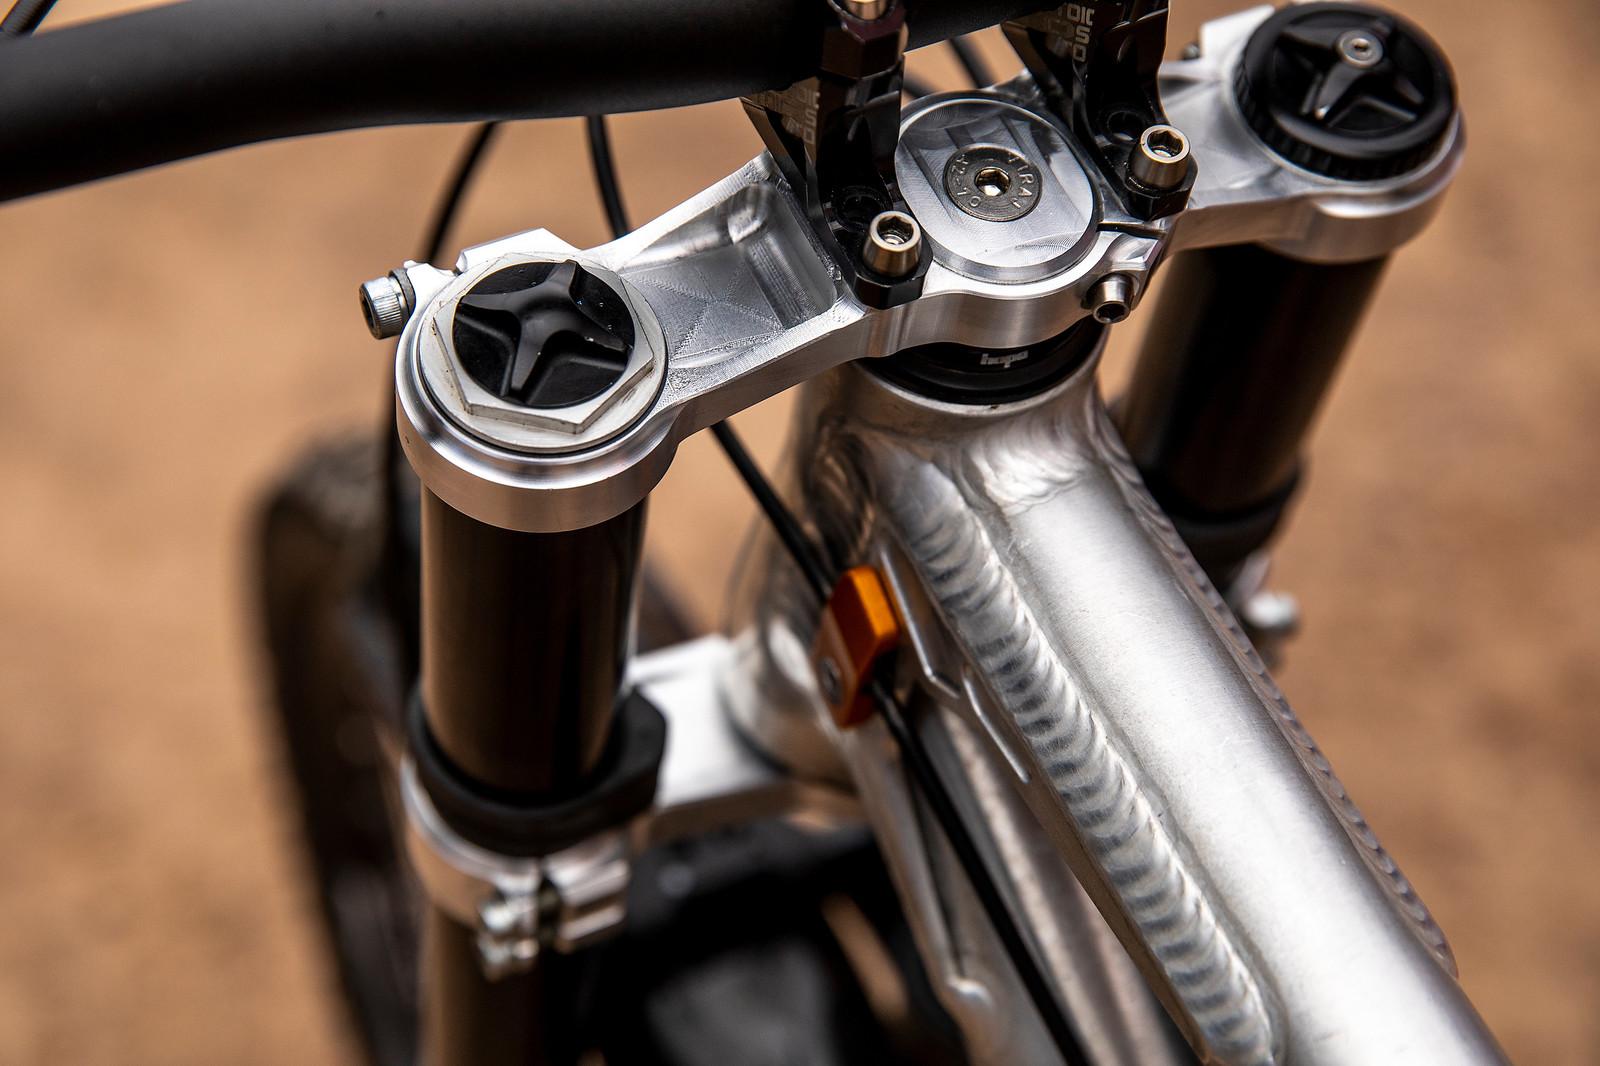 A Trek Truck Driver's Trail Bike - PIT BITS - La Bresse World Cup Downhill - Mountain Biking Pictures - Vital MTB